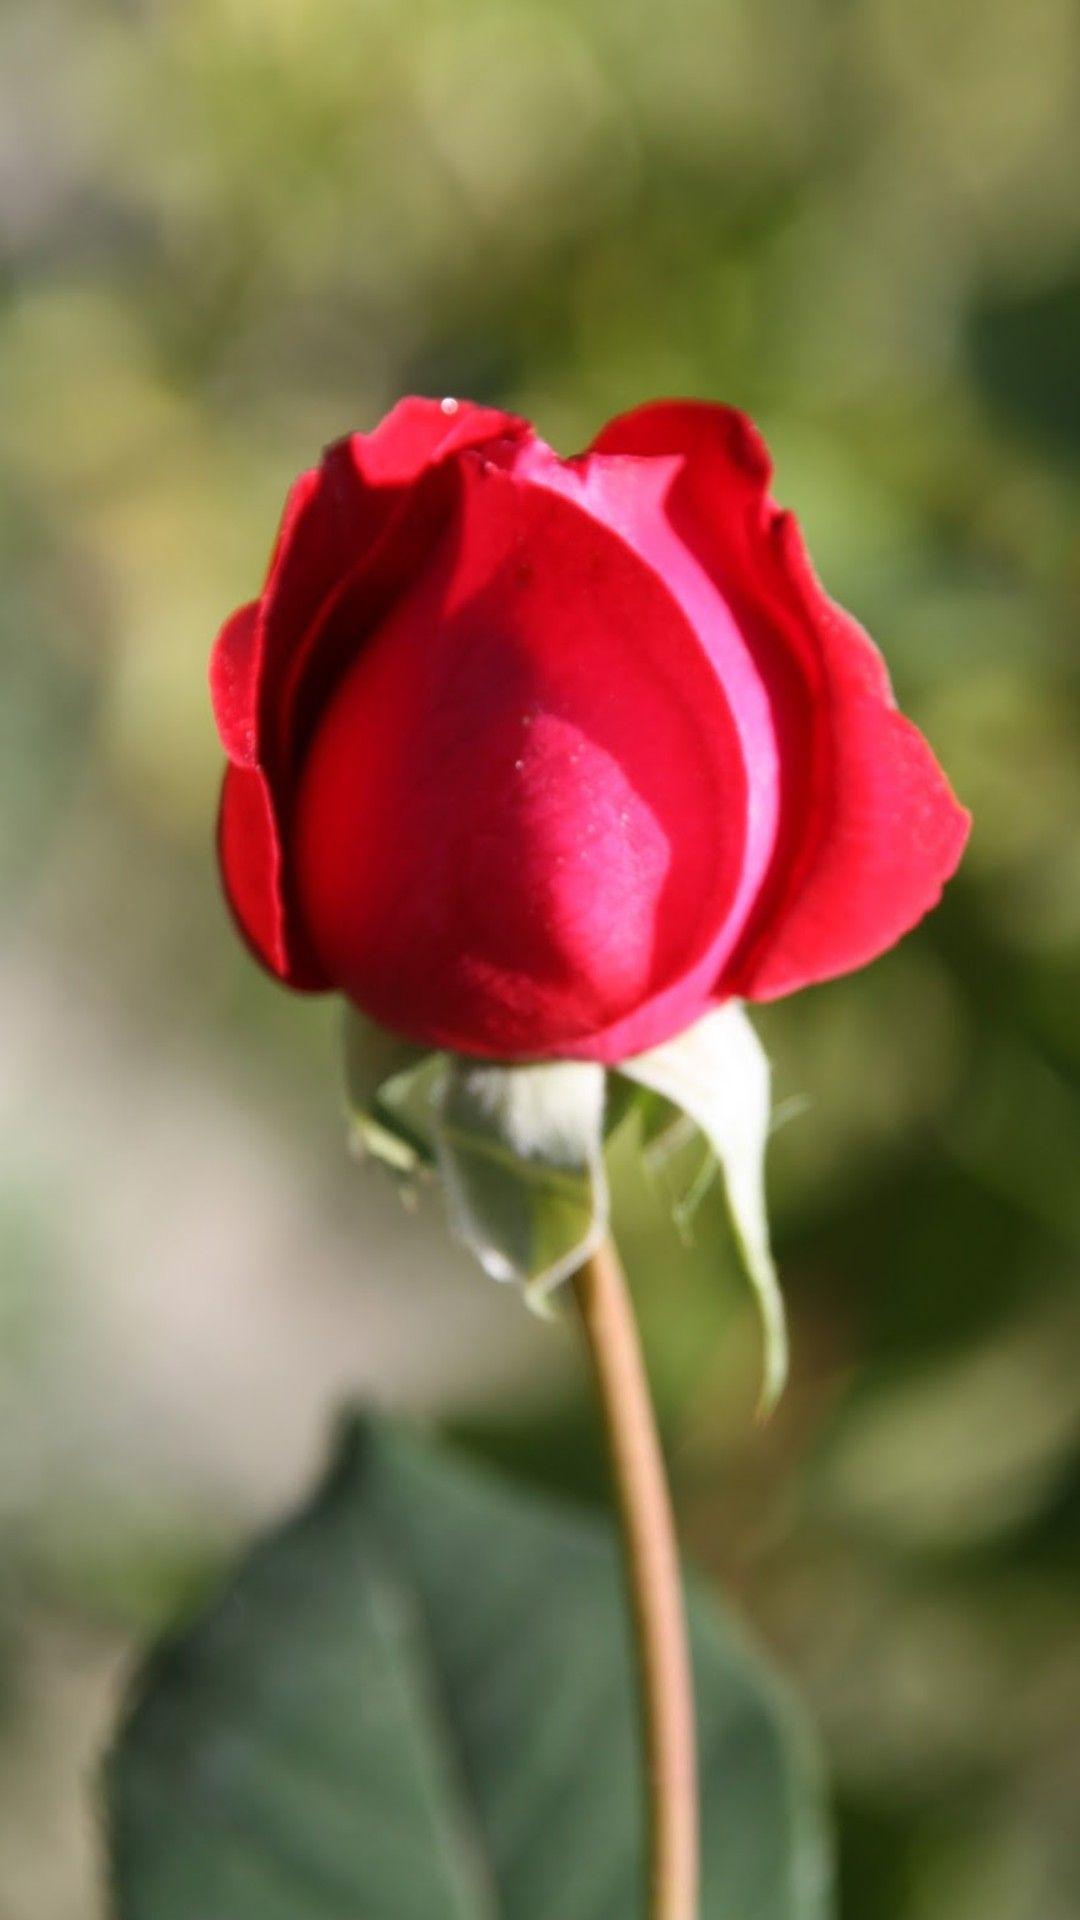 Single Rose Beautiful Roses Flower Photography Tulips Fragrance Flowers Perfume Tulip